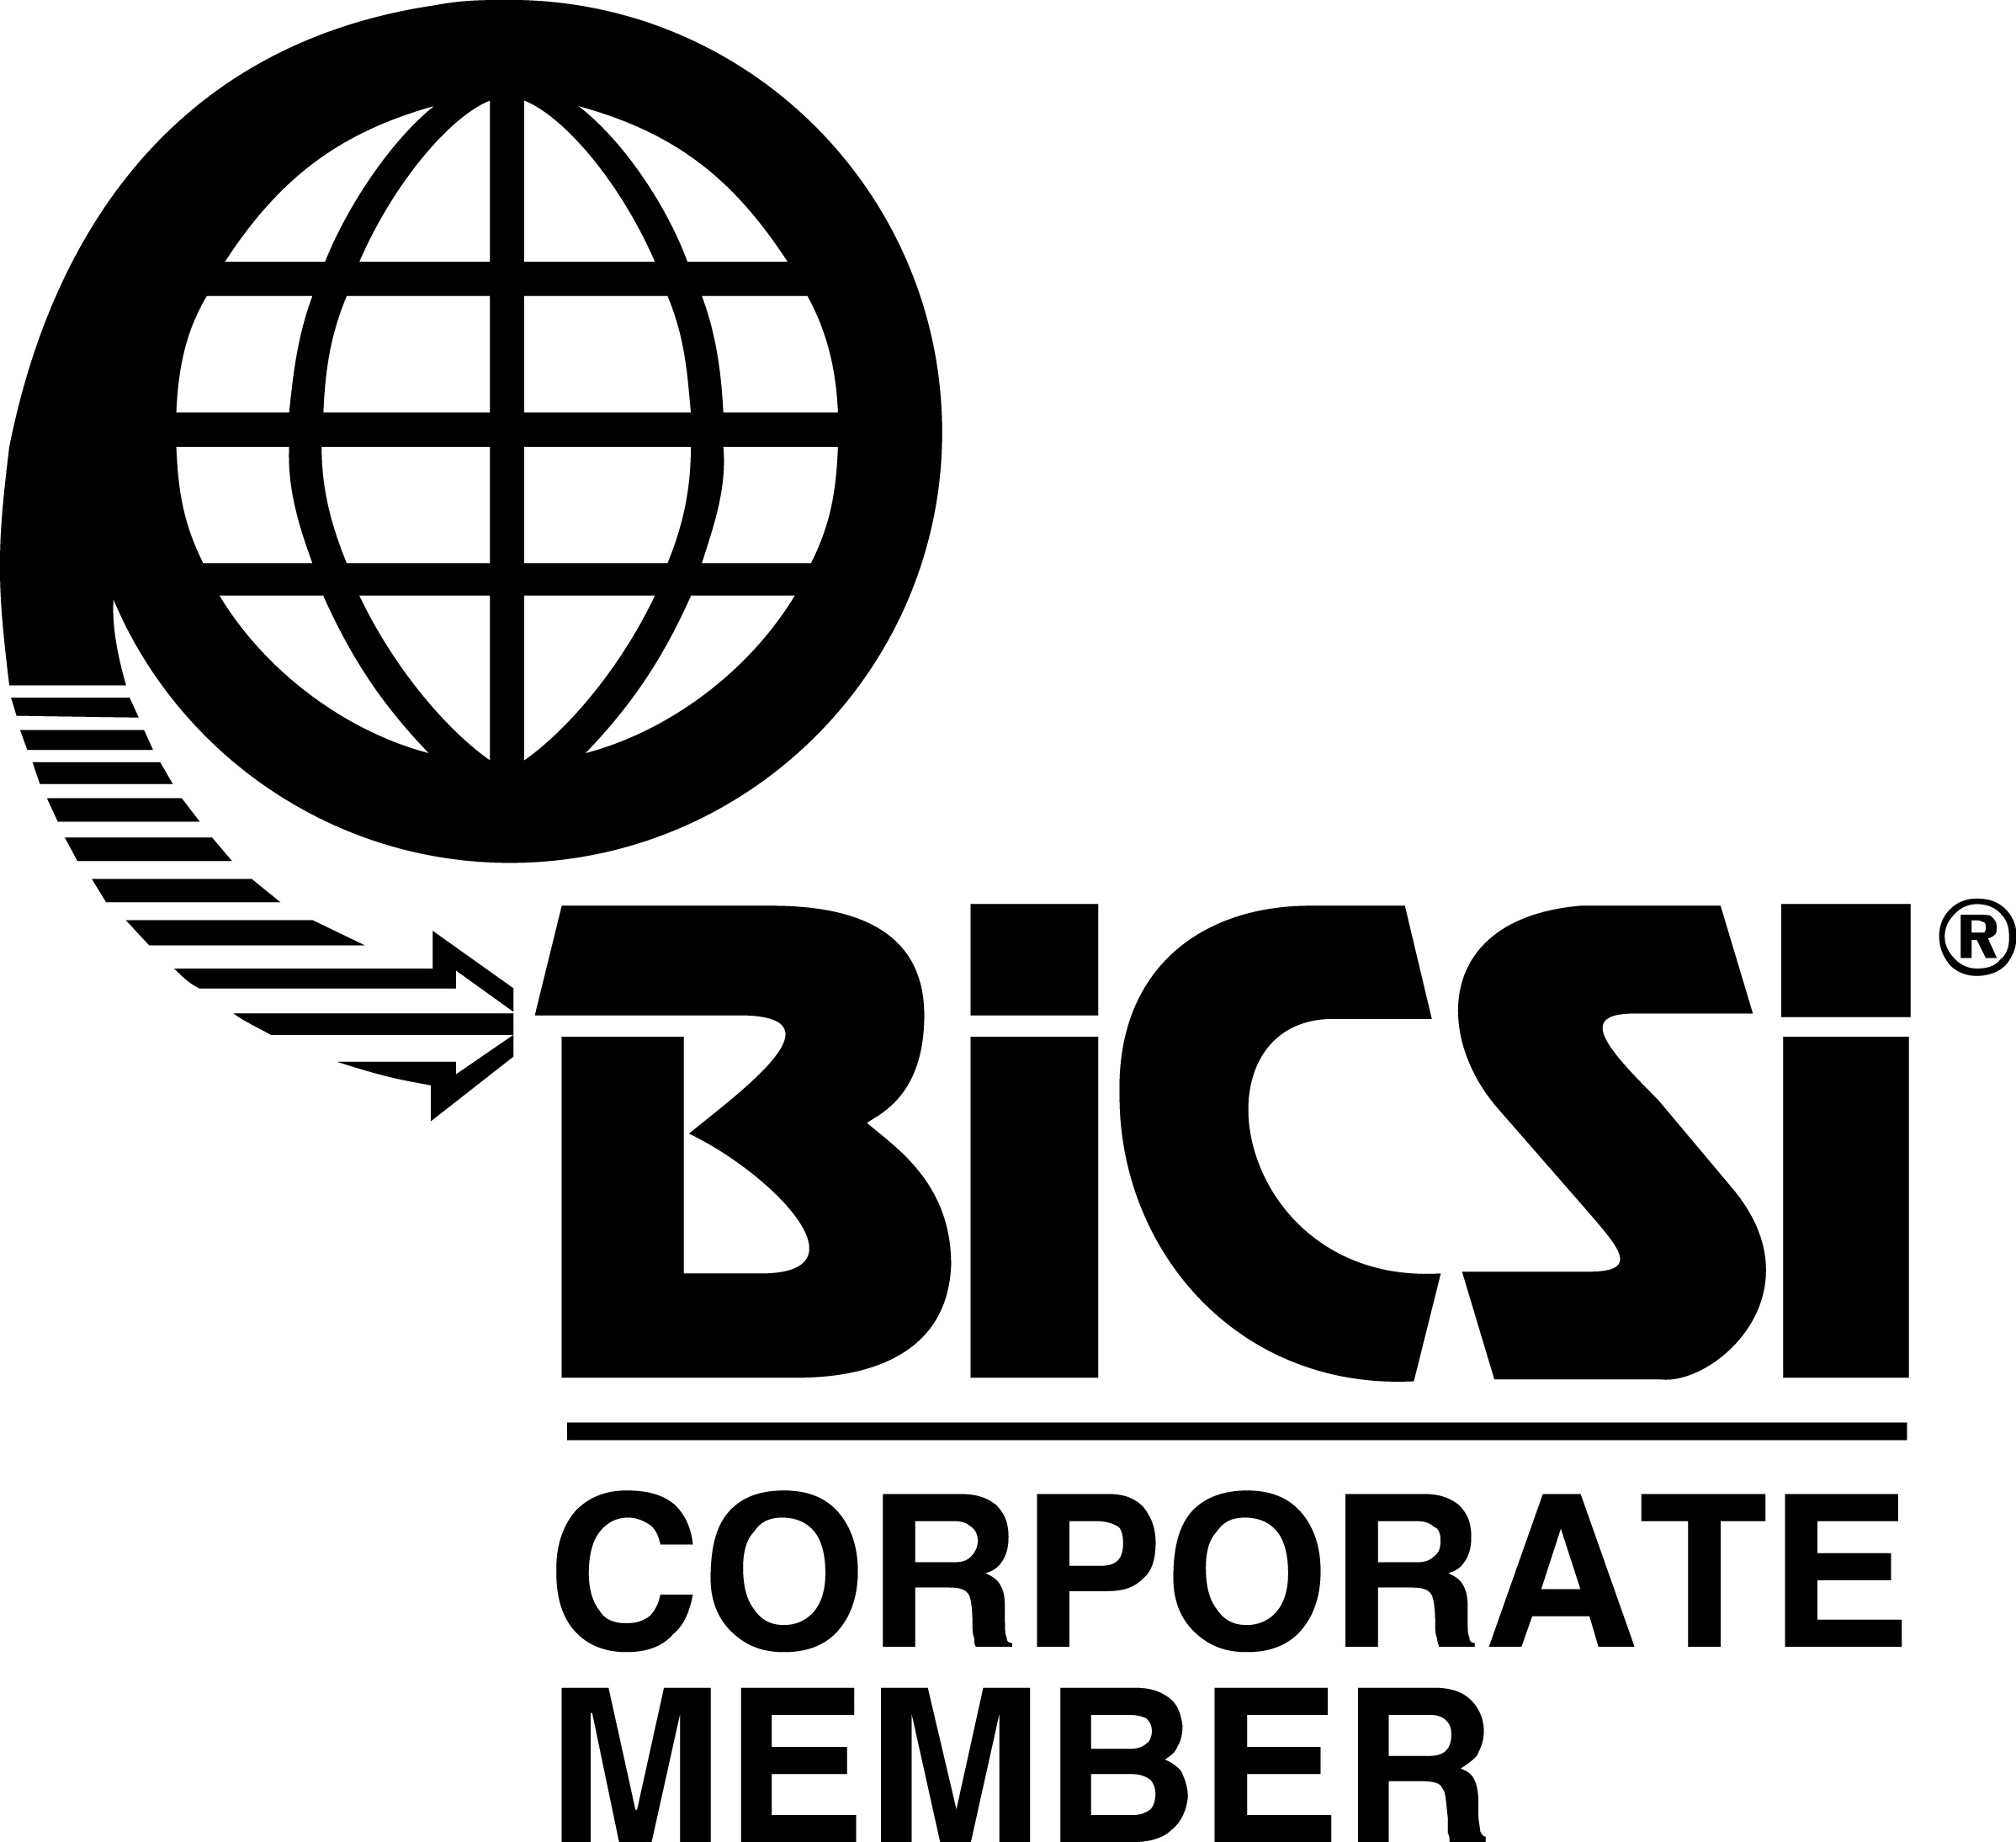 bicsi member vector logos fiber technician communications dial cabling